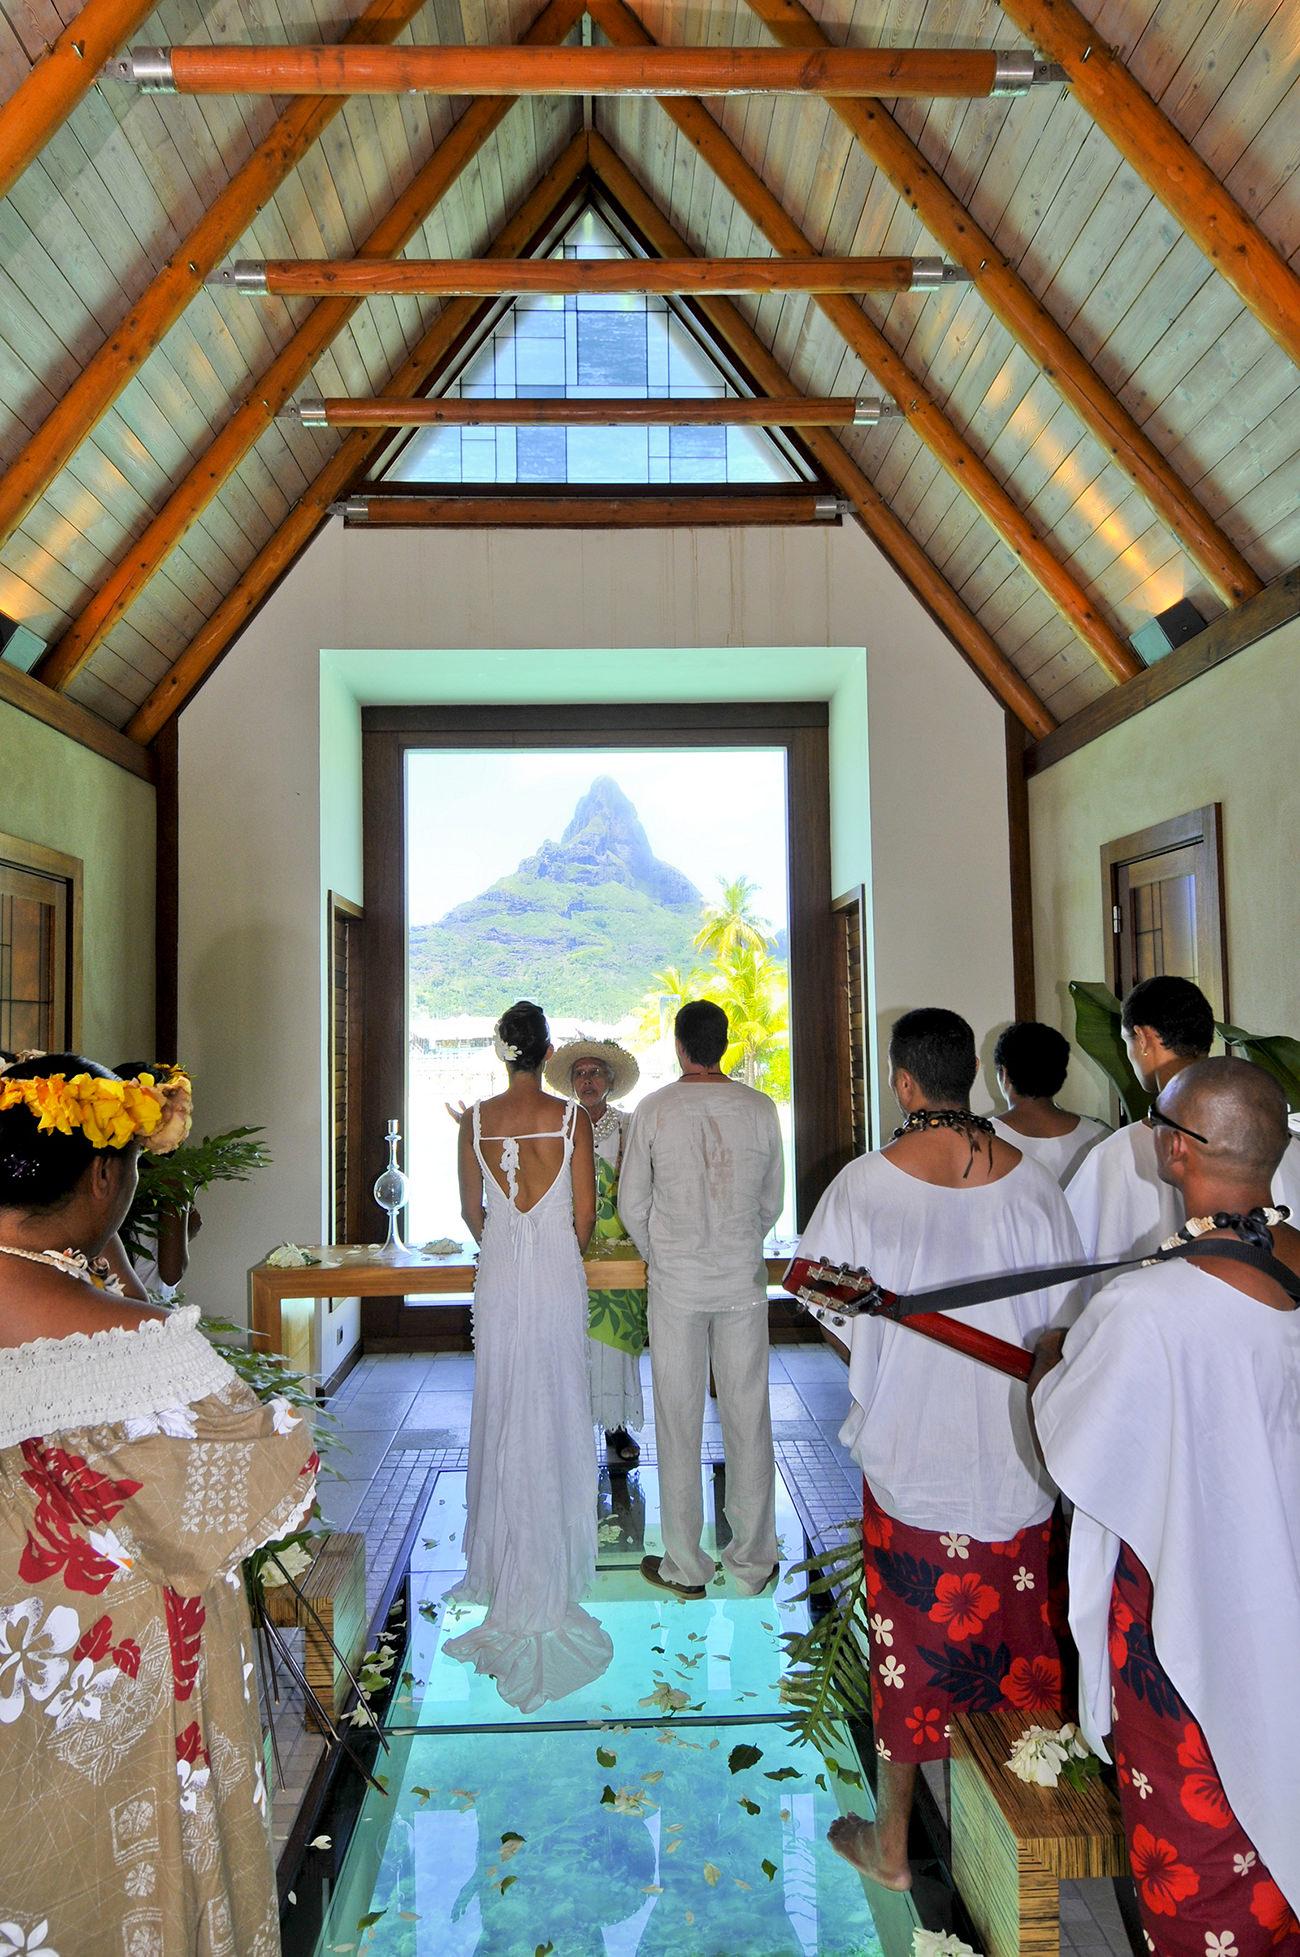 InterContinental-Bora Bora-Resort-Thalasso-Spa-8